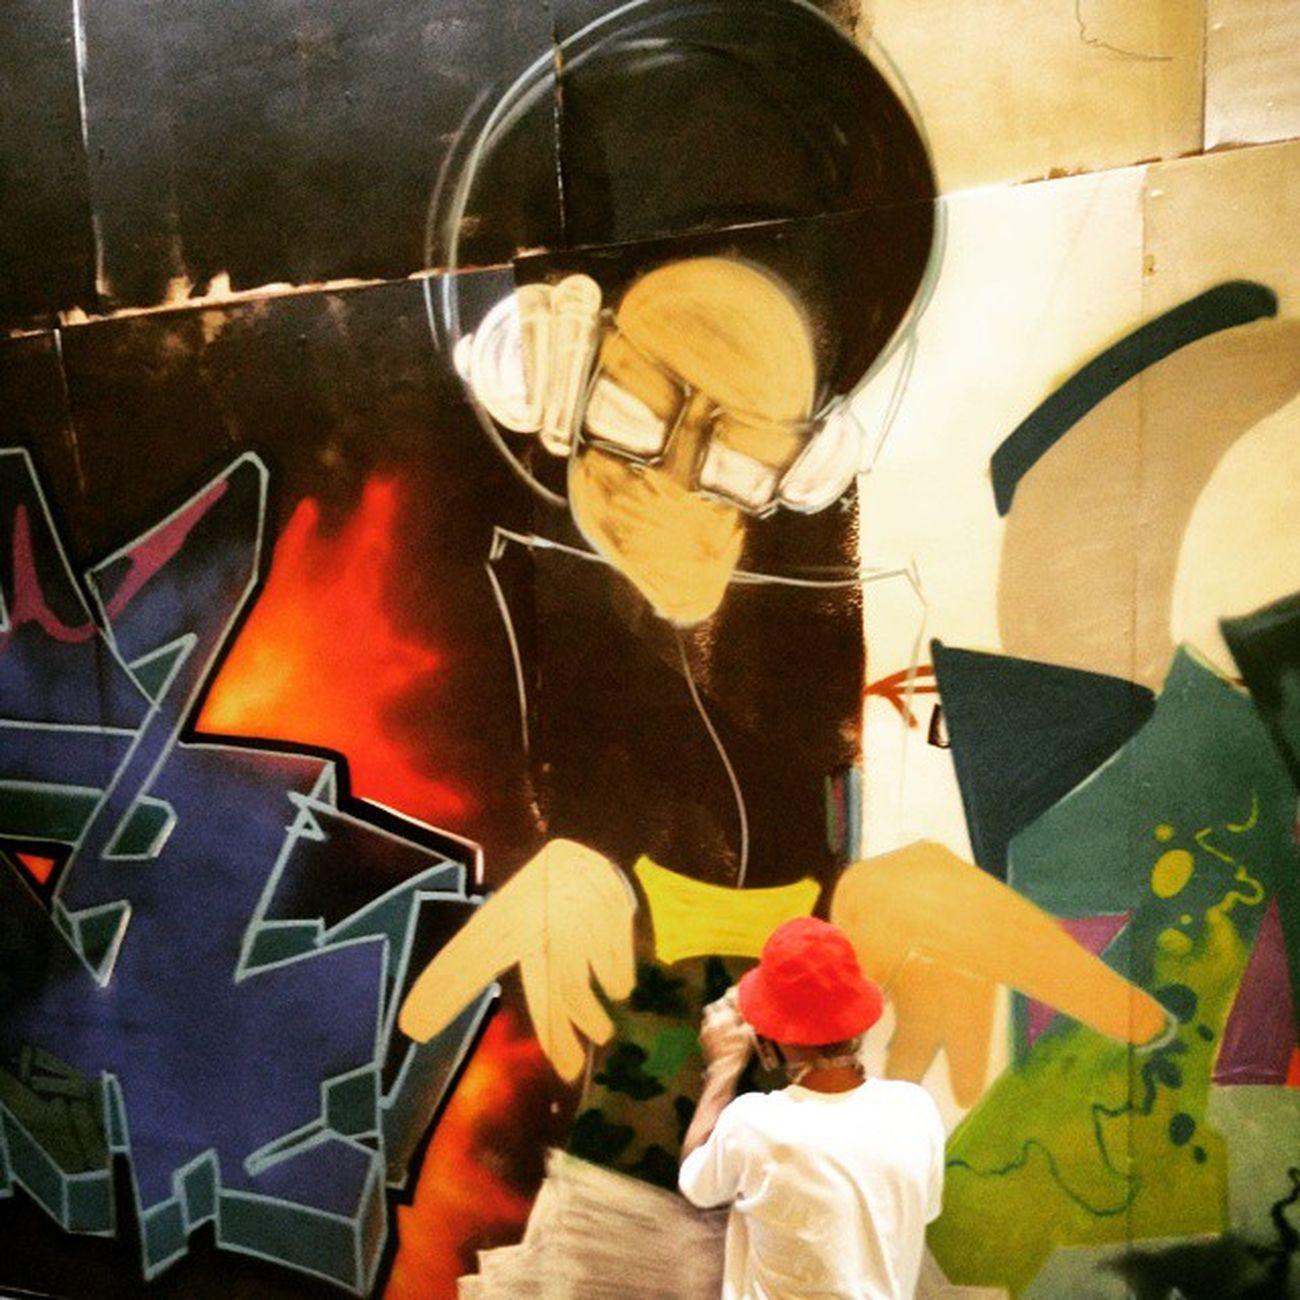 Finishing touches. Graffiti Streetnightsjbr